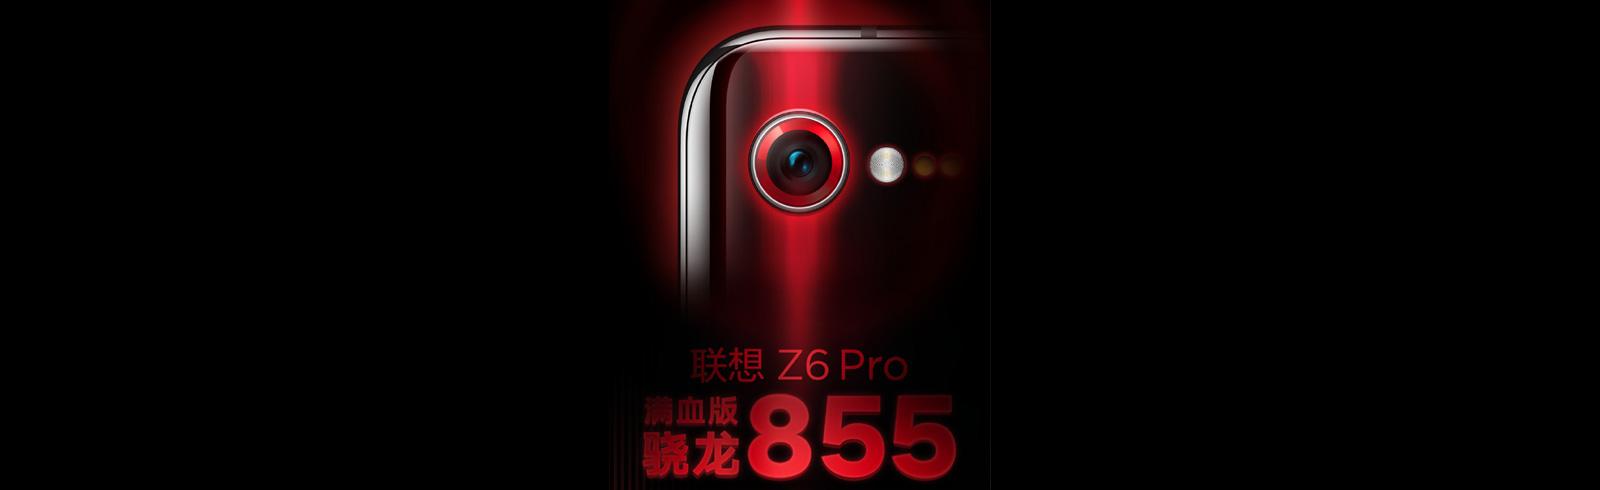 Lenovo Z6 Pro to have a 2.39 cm super macro lens